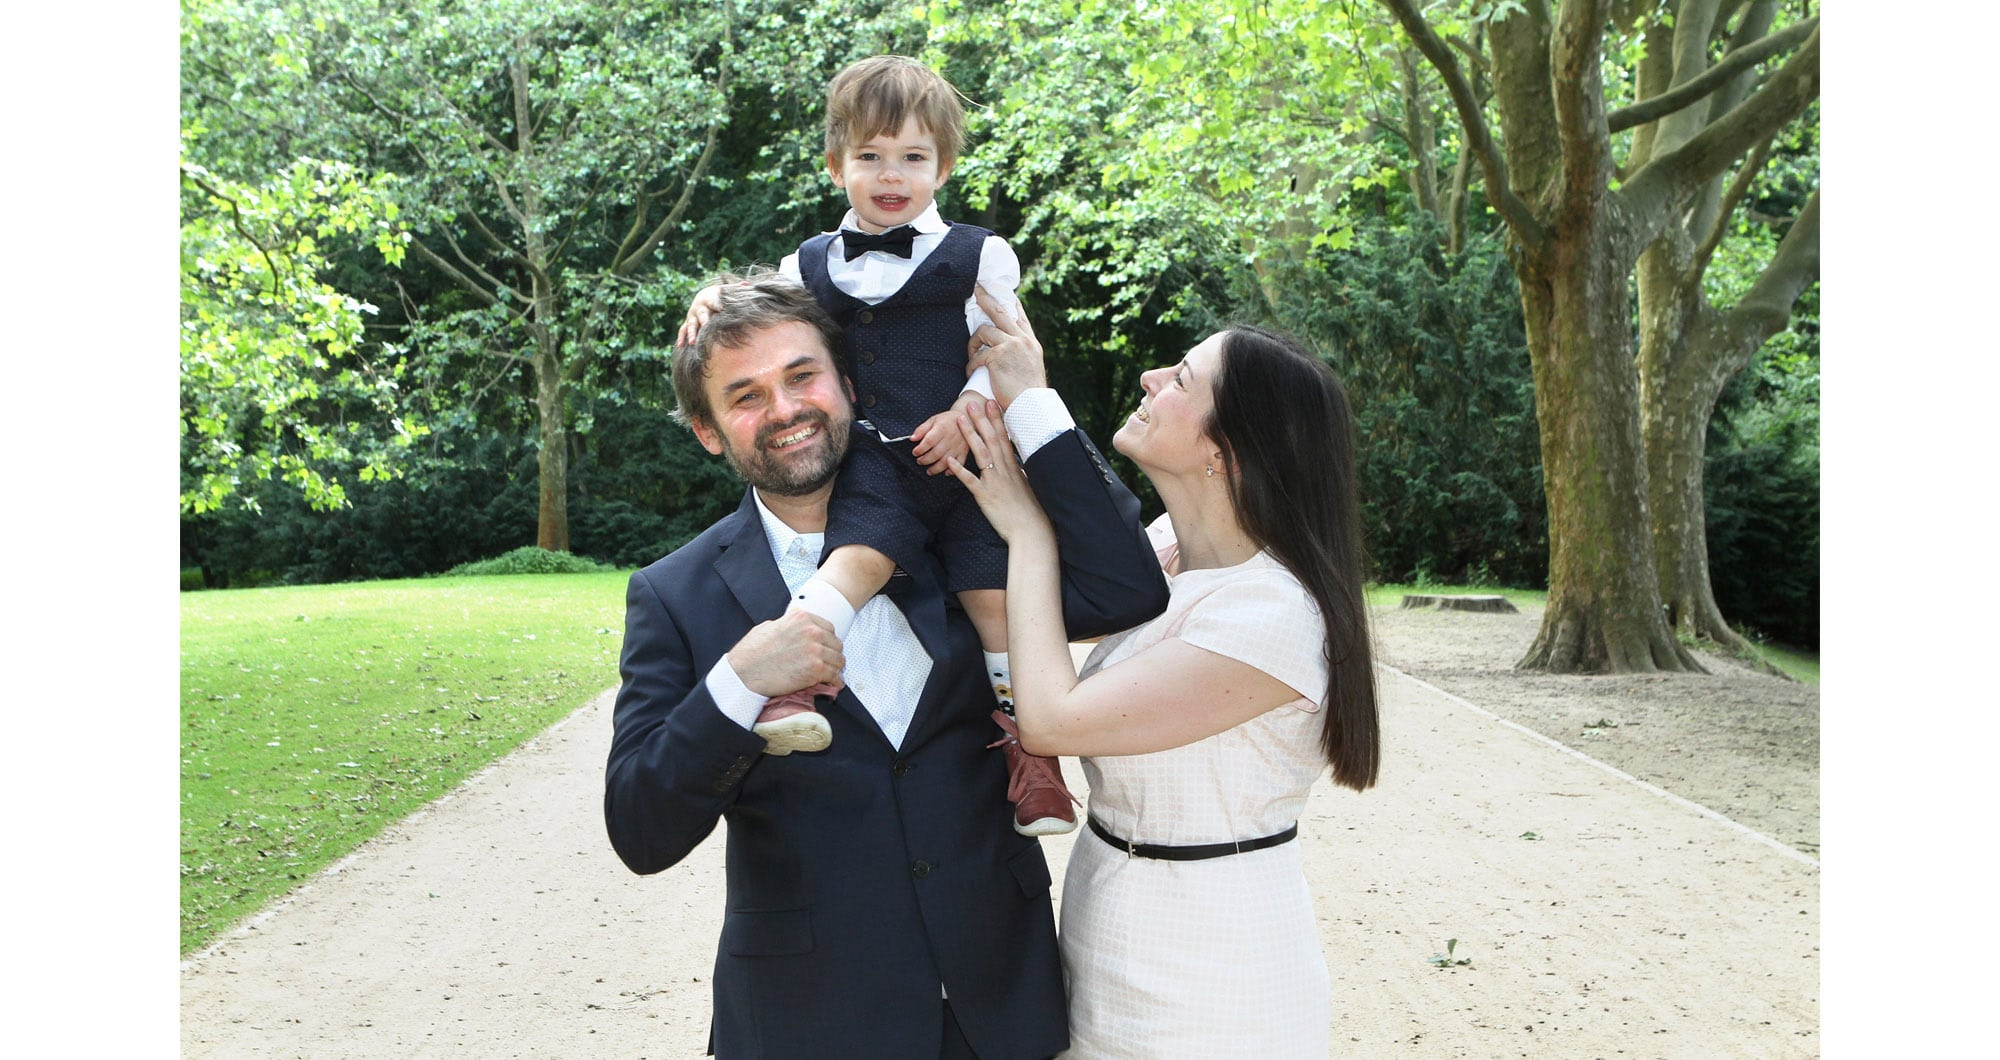 familieundkinderfoto-lenzvonkolkow-fotografie39